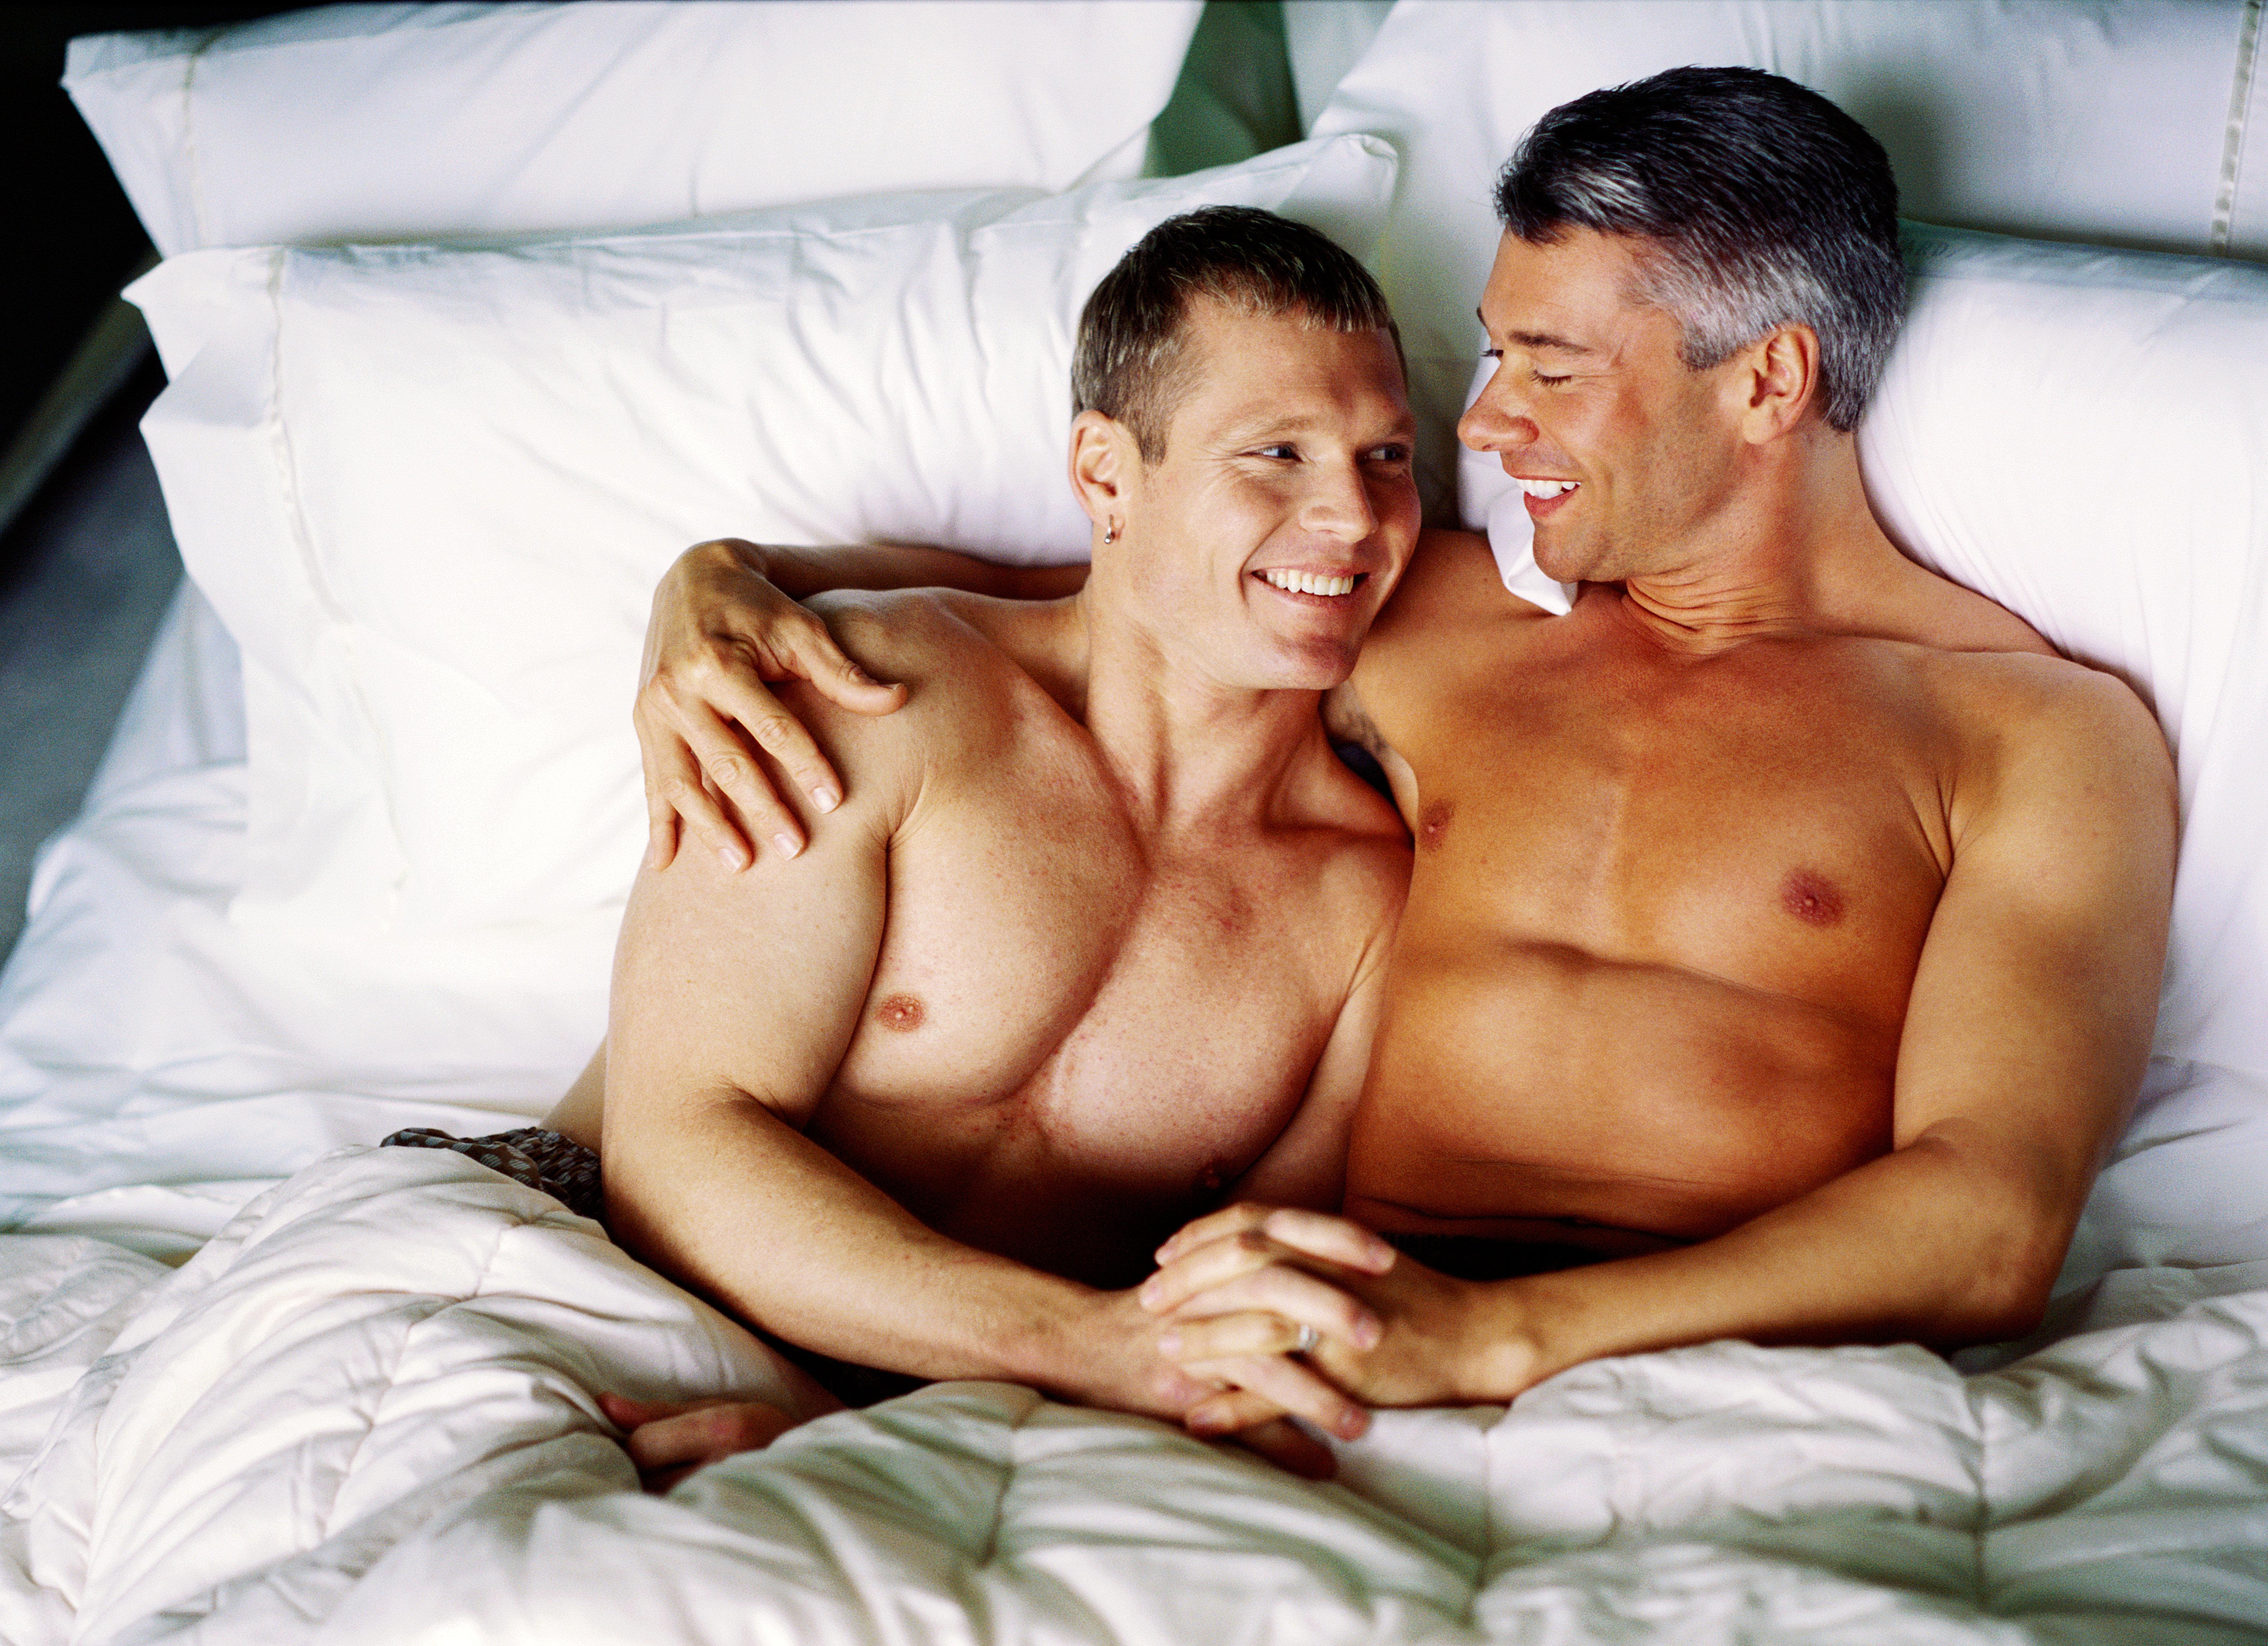 Gay male com